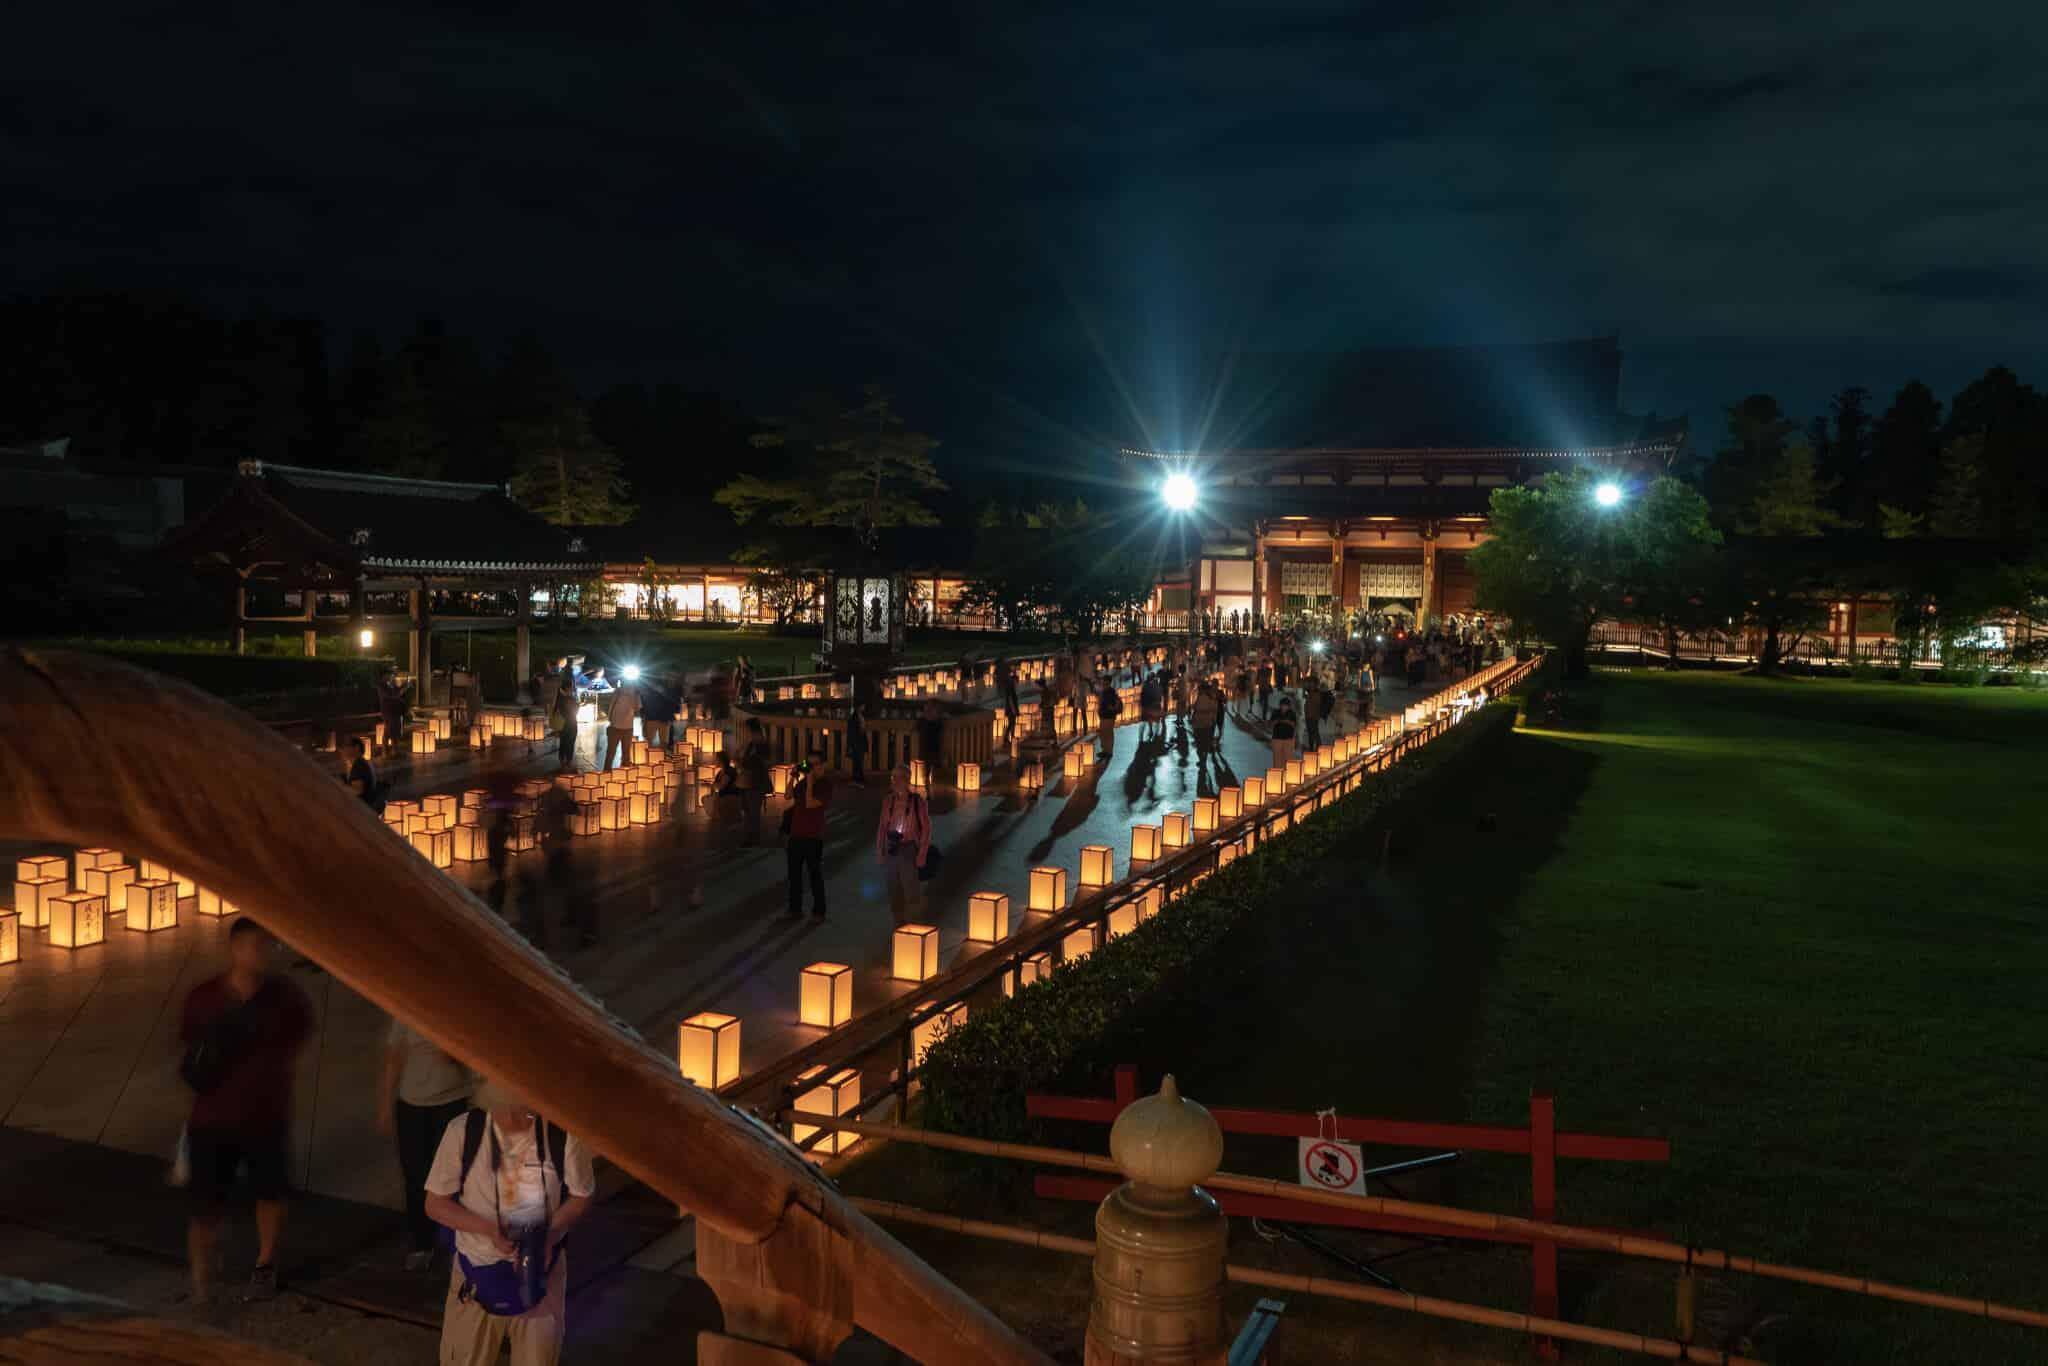 東大寺の万灯供養会